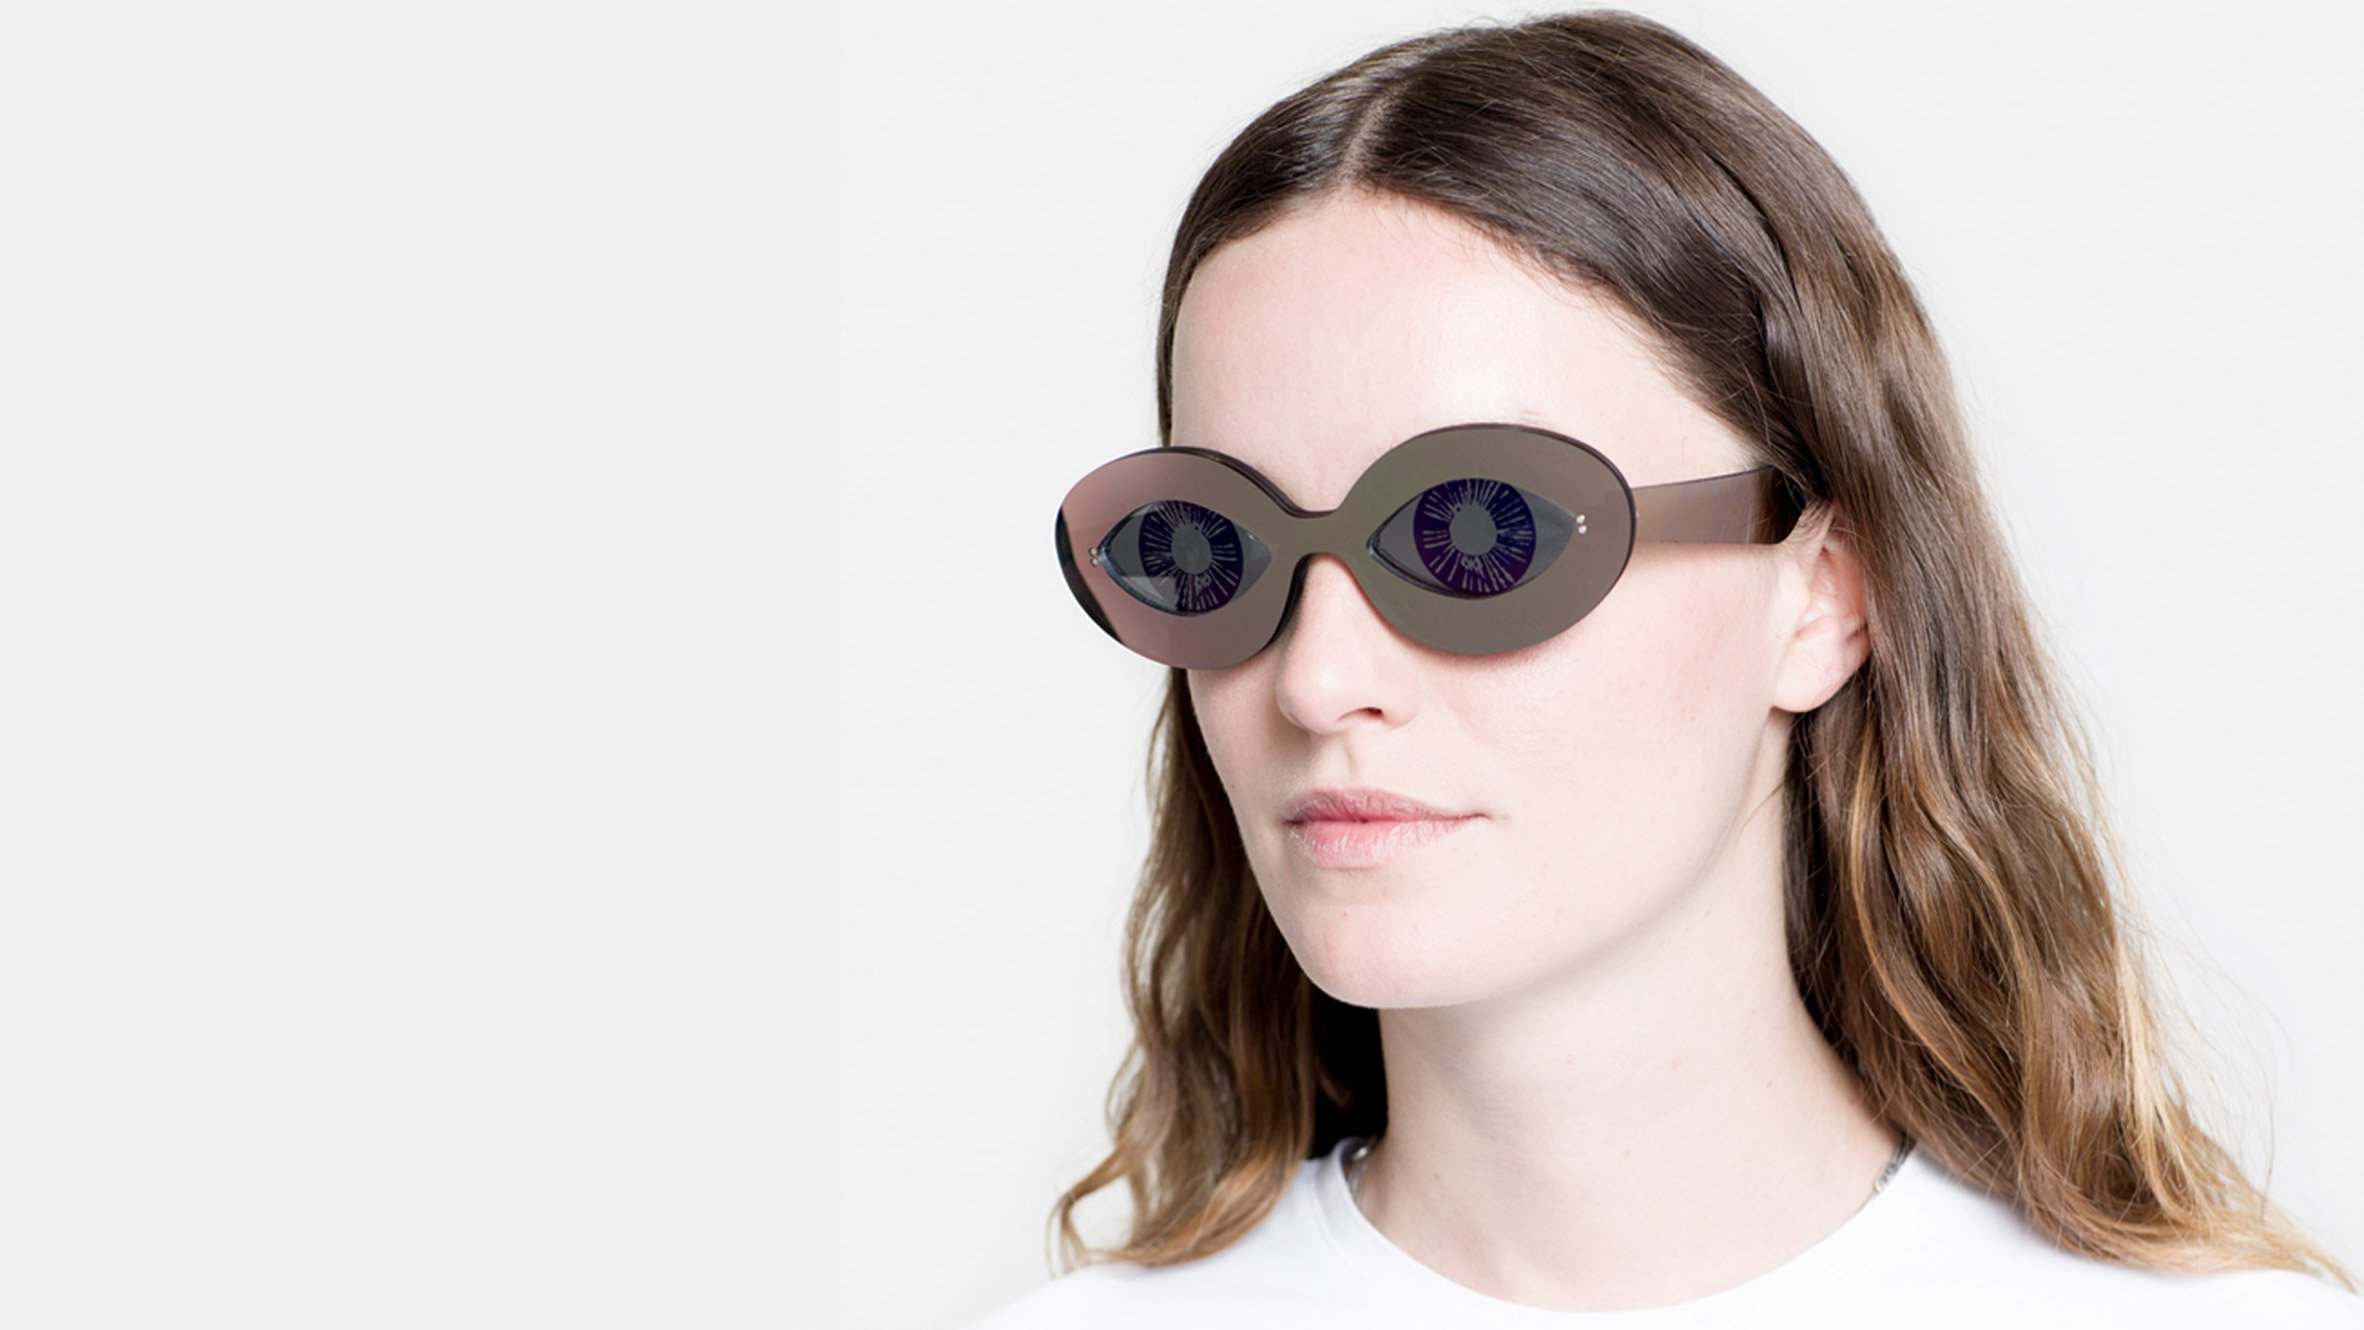 andy-warhol-sunglasses-super-collaboration-eyewear-illustrations-design_dezeen_2364_hero2